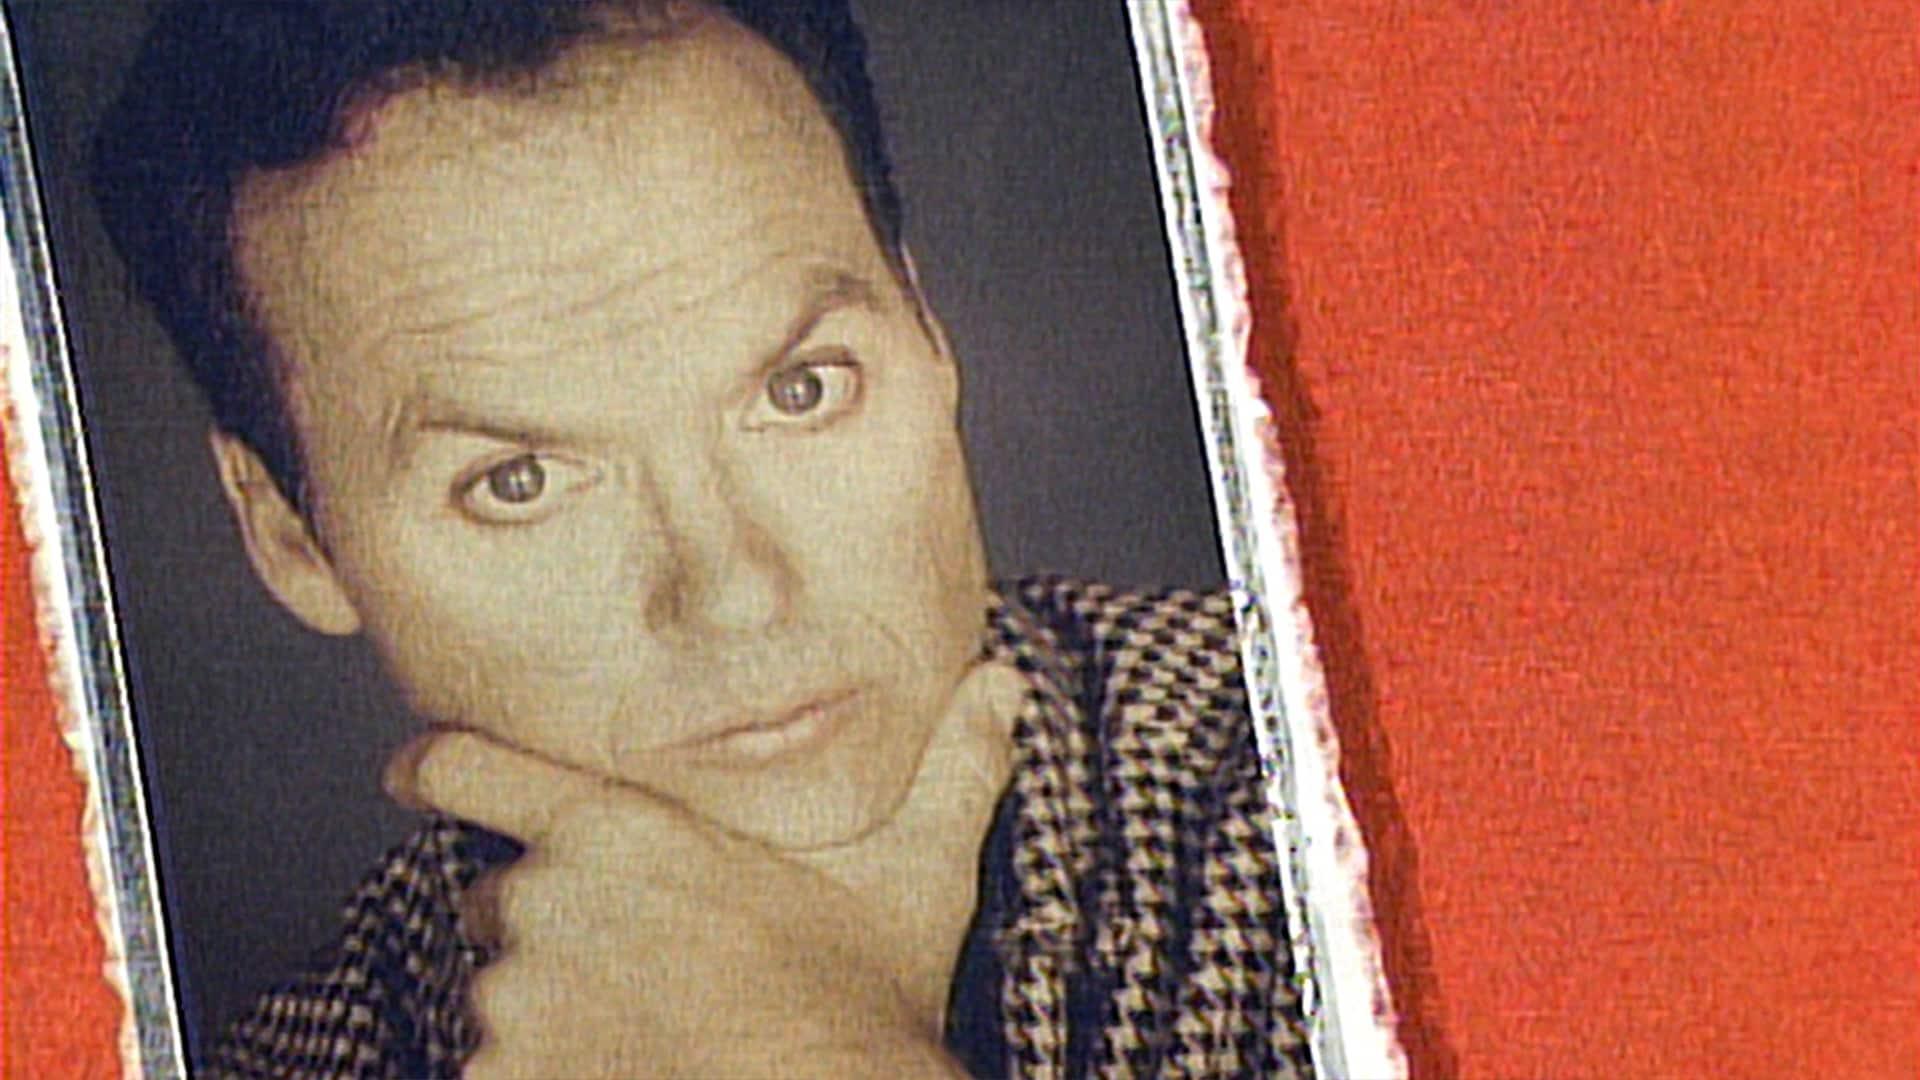 Michael Keaton: November 14, 1992